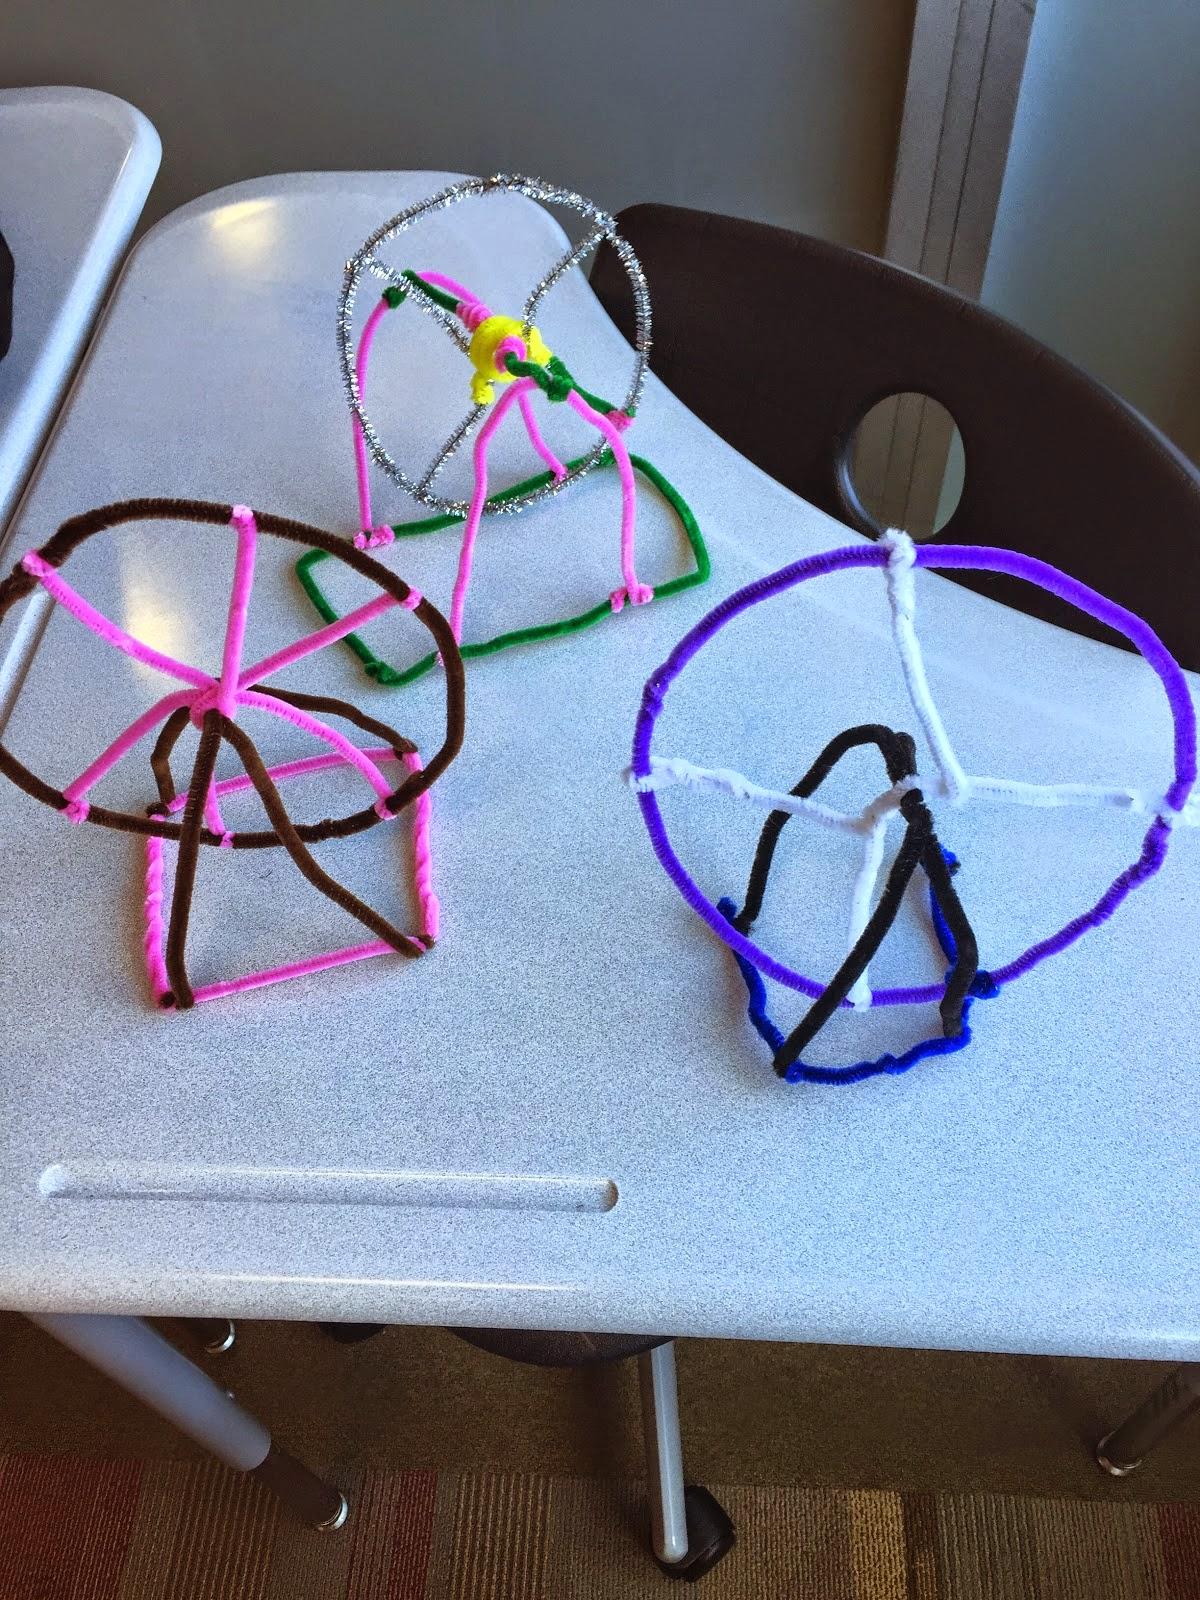 Ferris Wheels Student's created